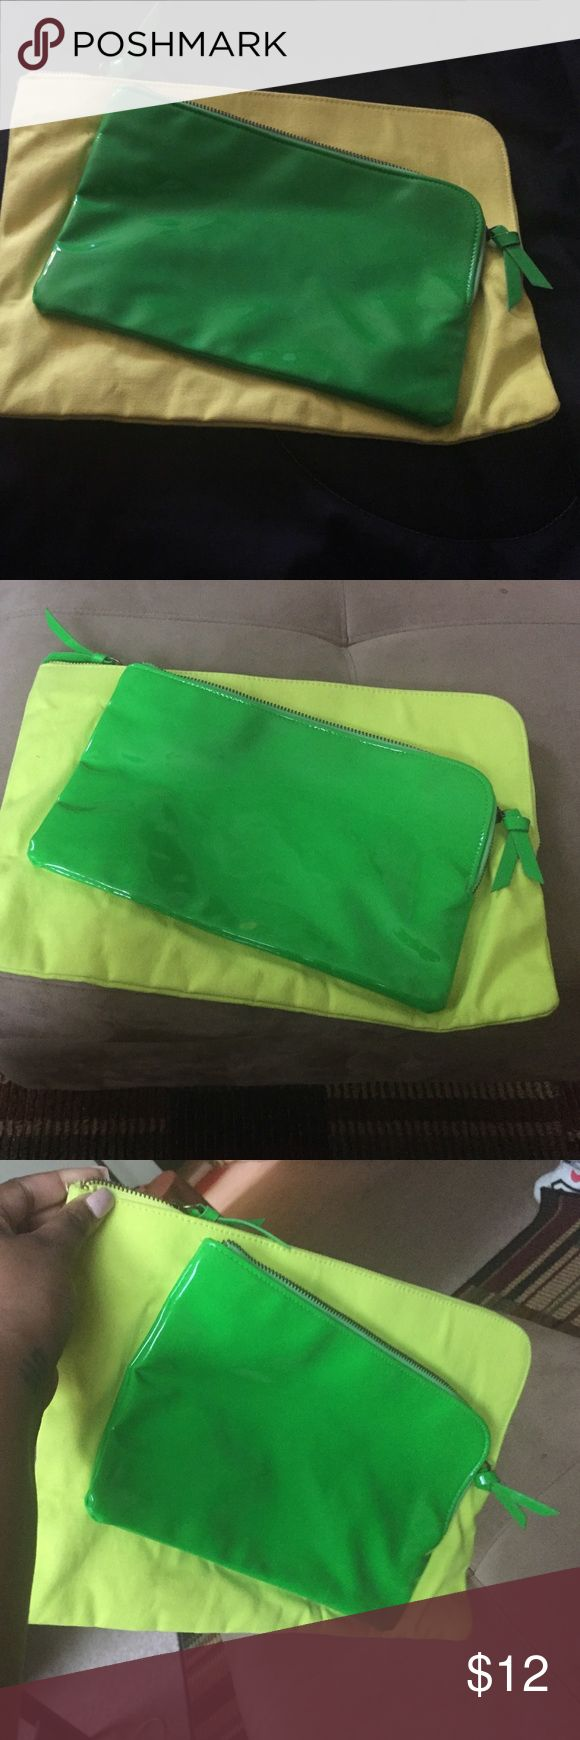 Green clutch NEW green clutch Bags Clutches & Wristlets